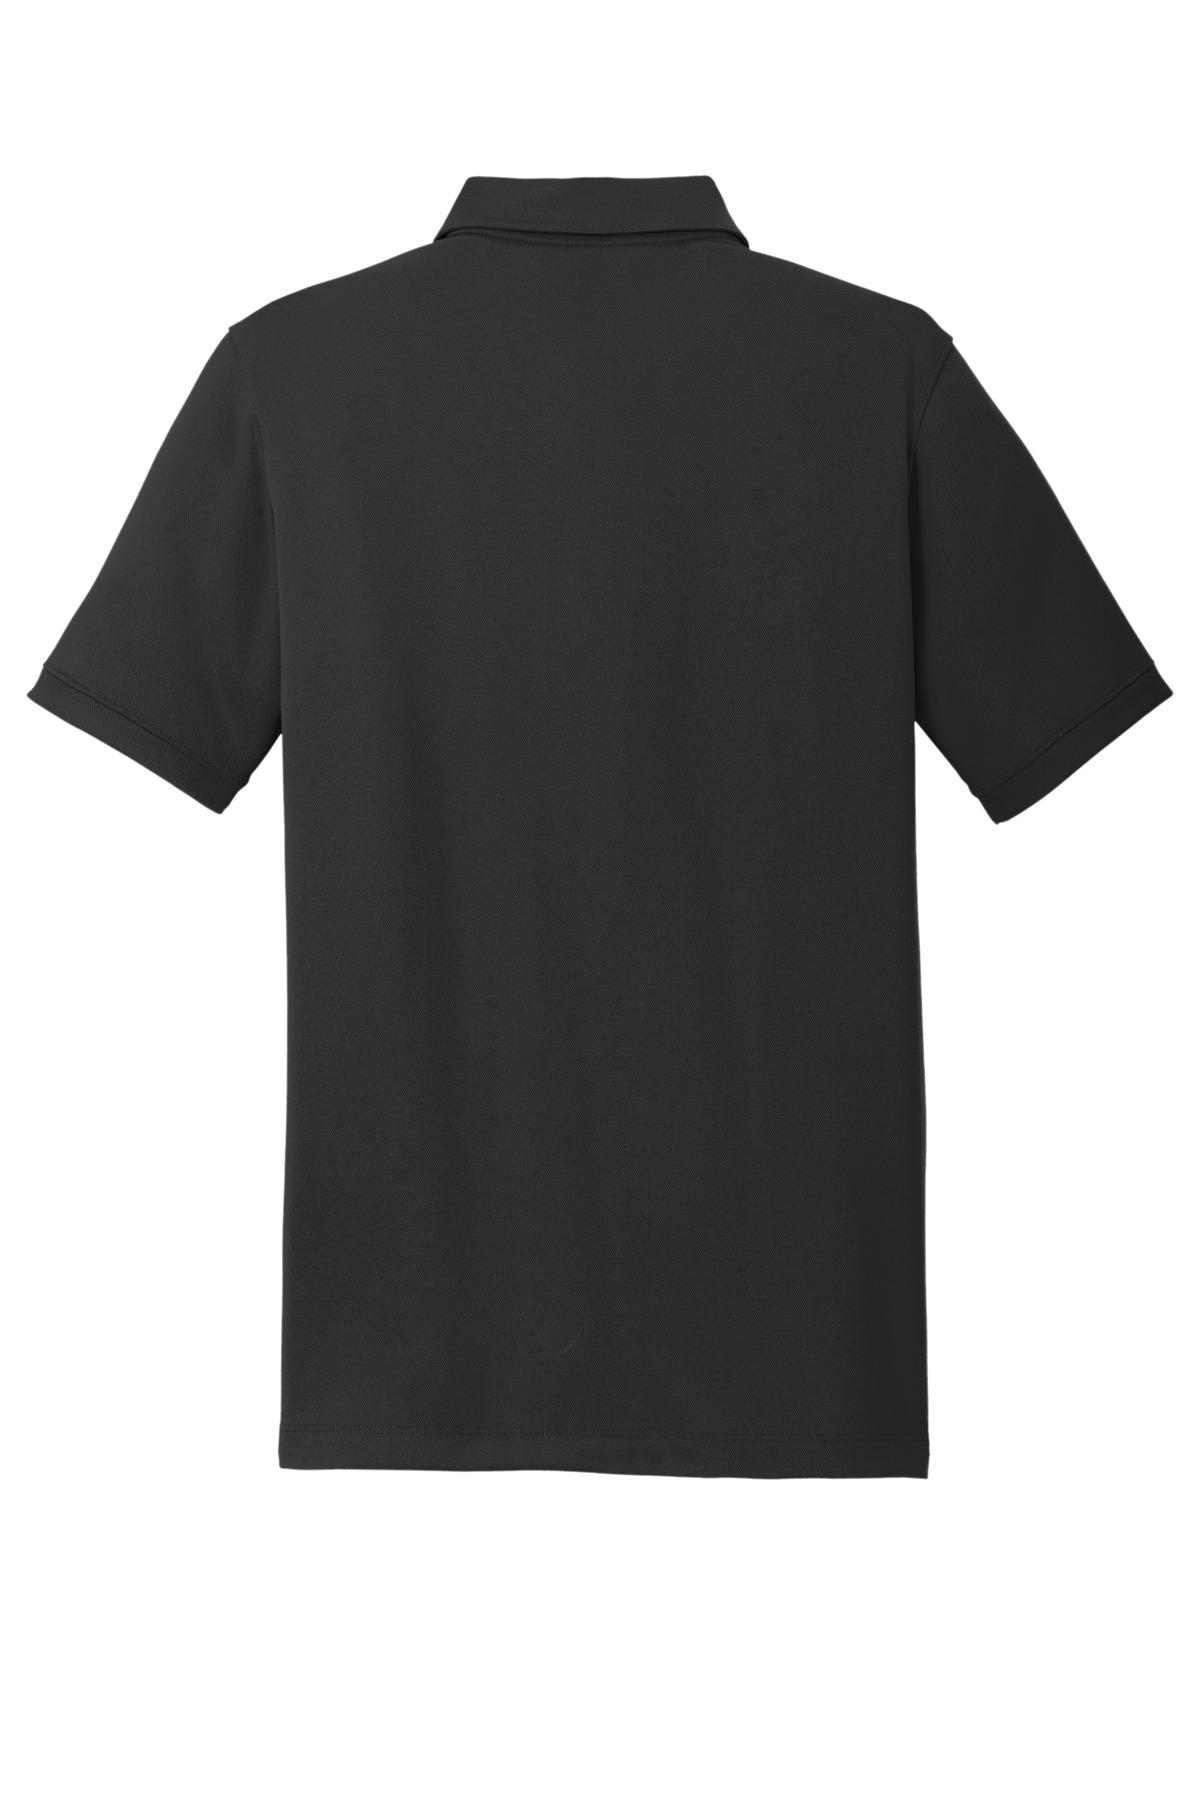 black flat back